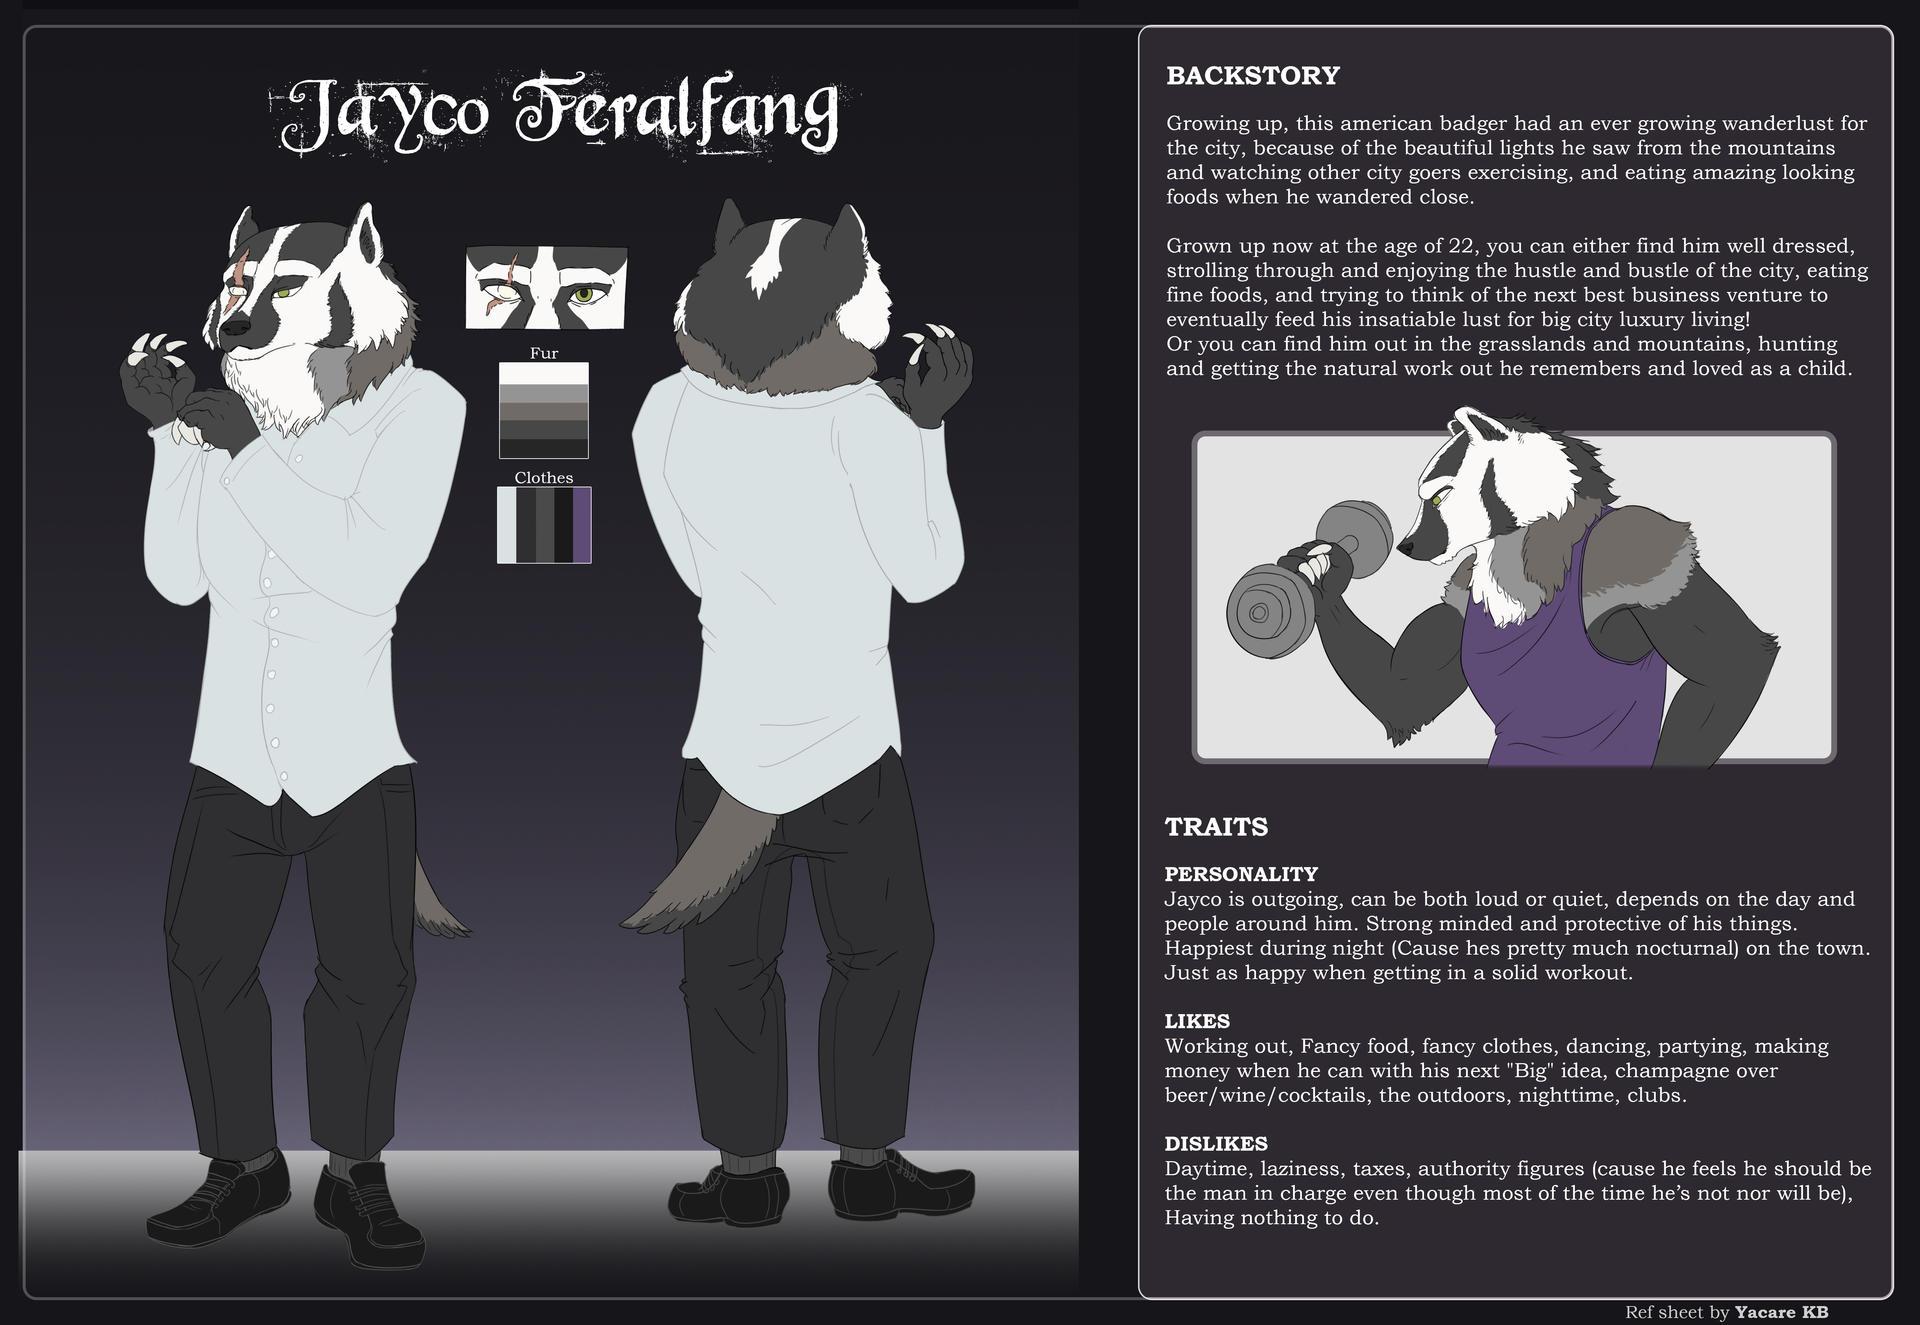 jayco_feralfang___ref_sheet_by_yacarekb_dddjtuy-fullview.jpg